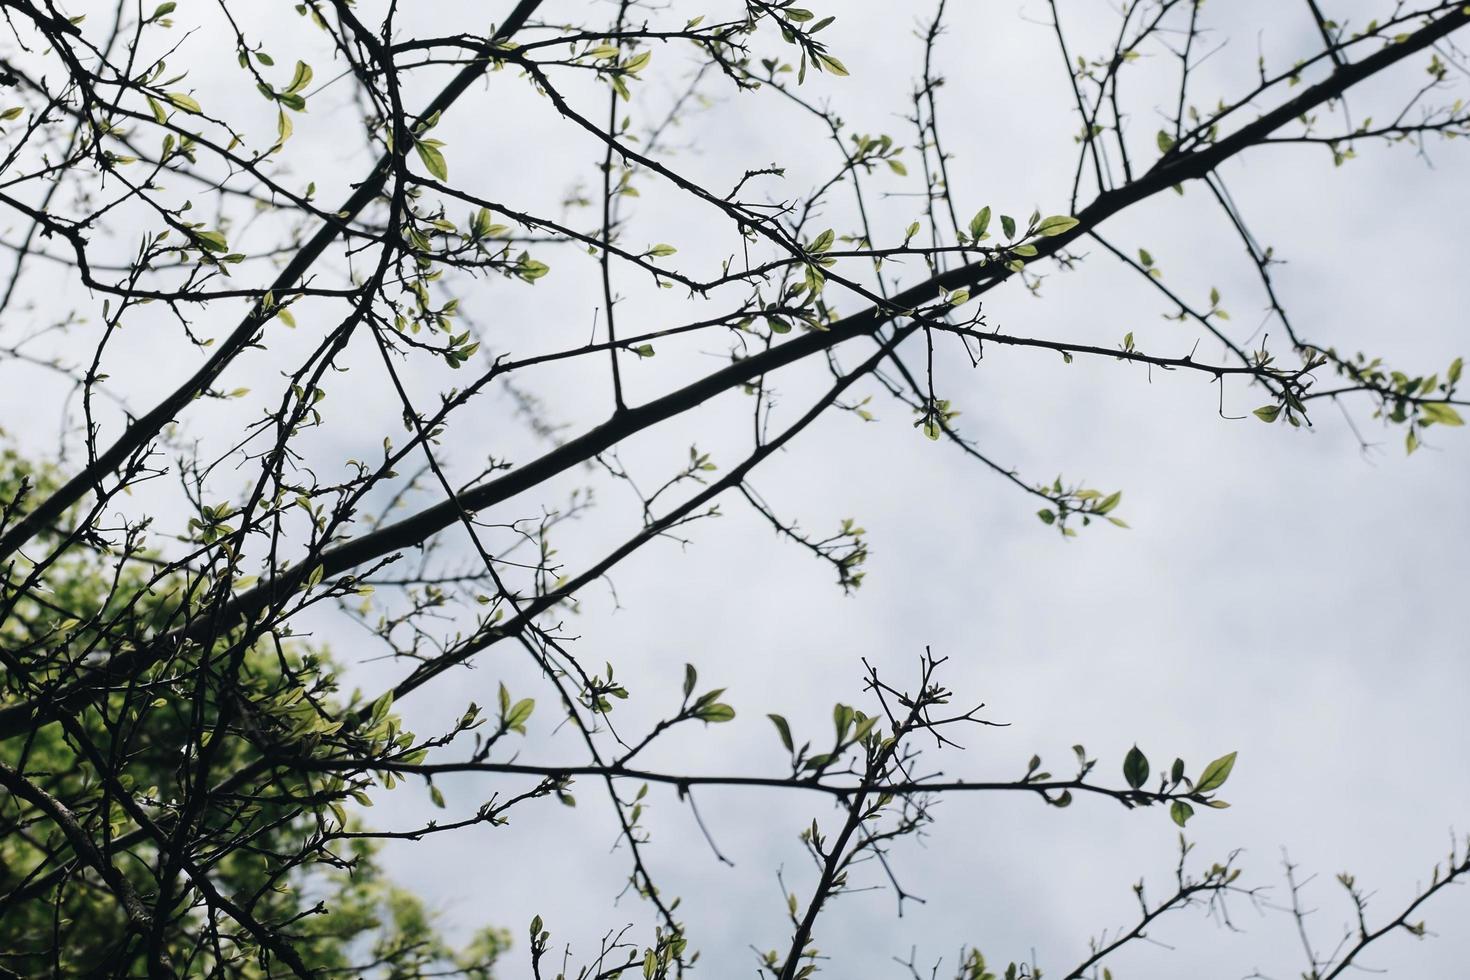 albero nudo foglia verde foto